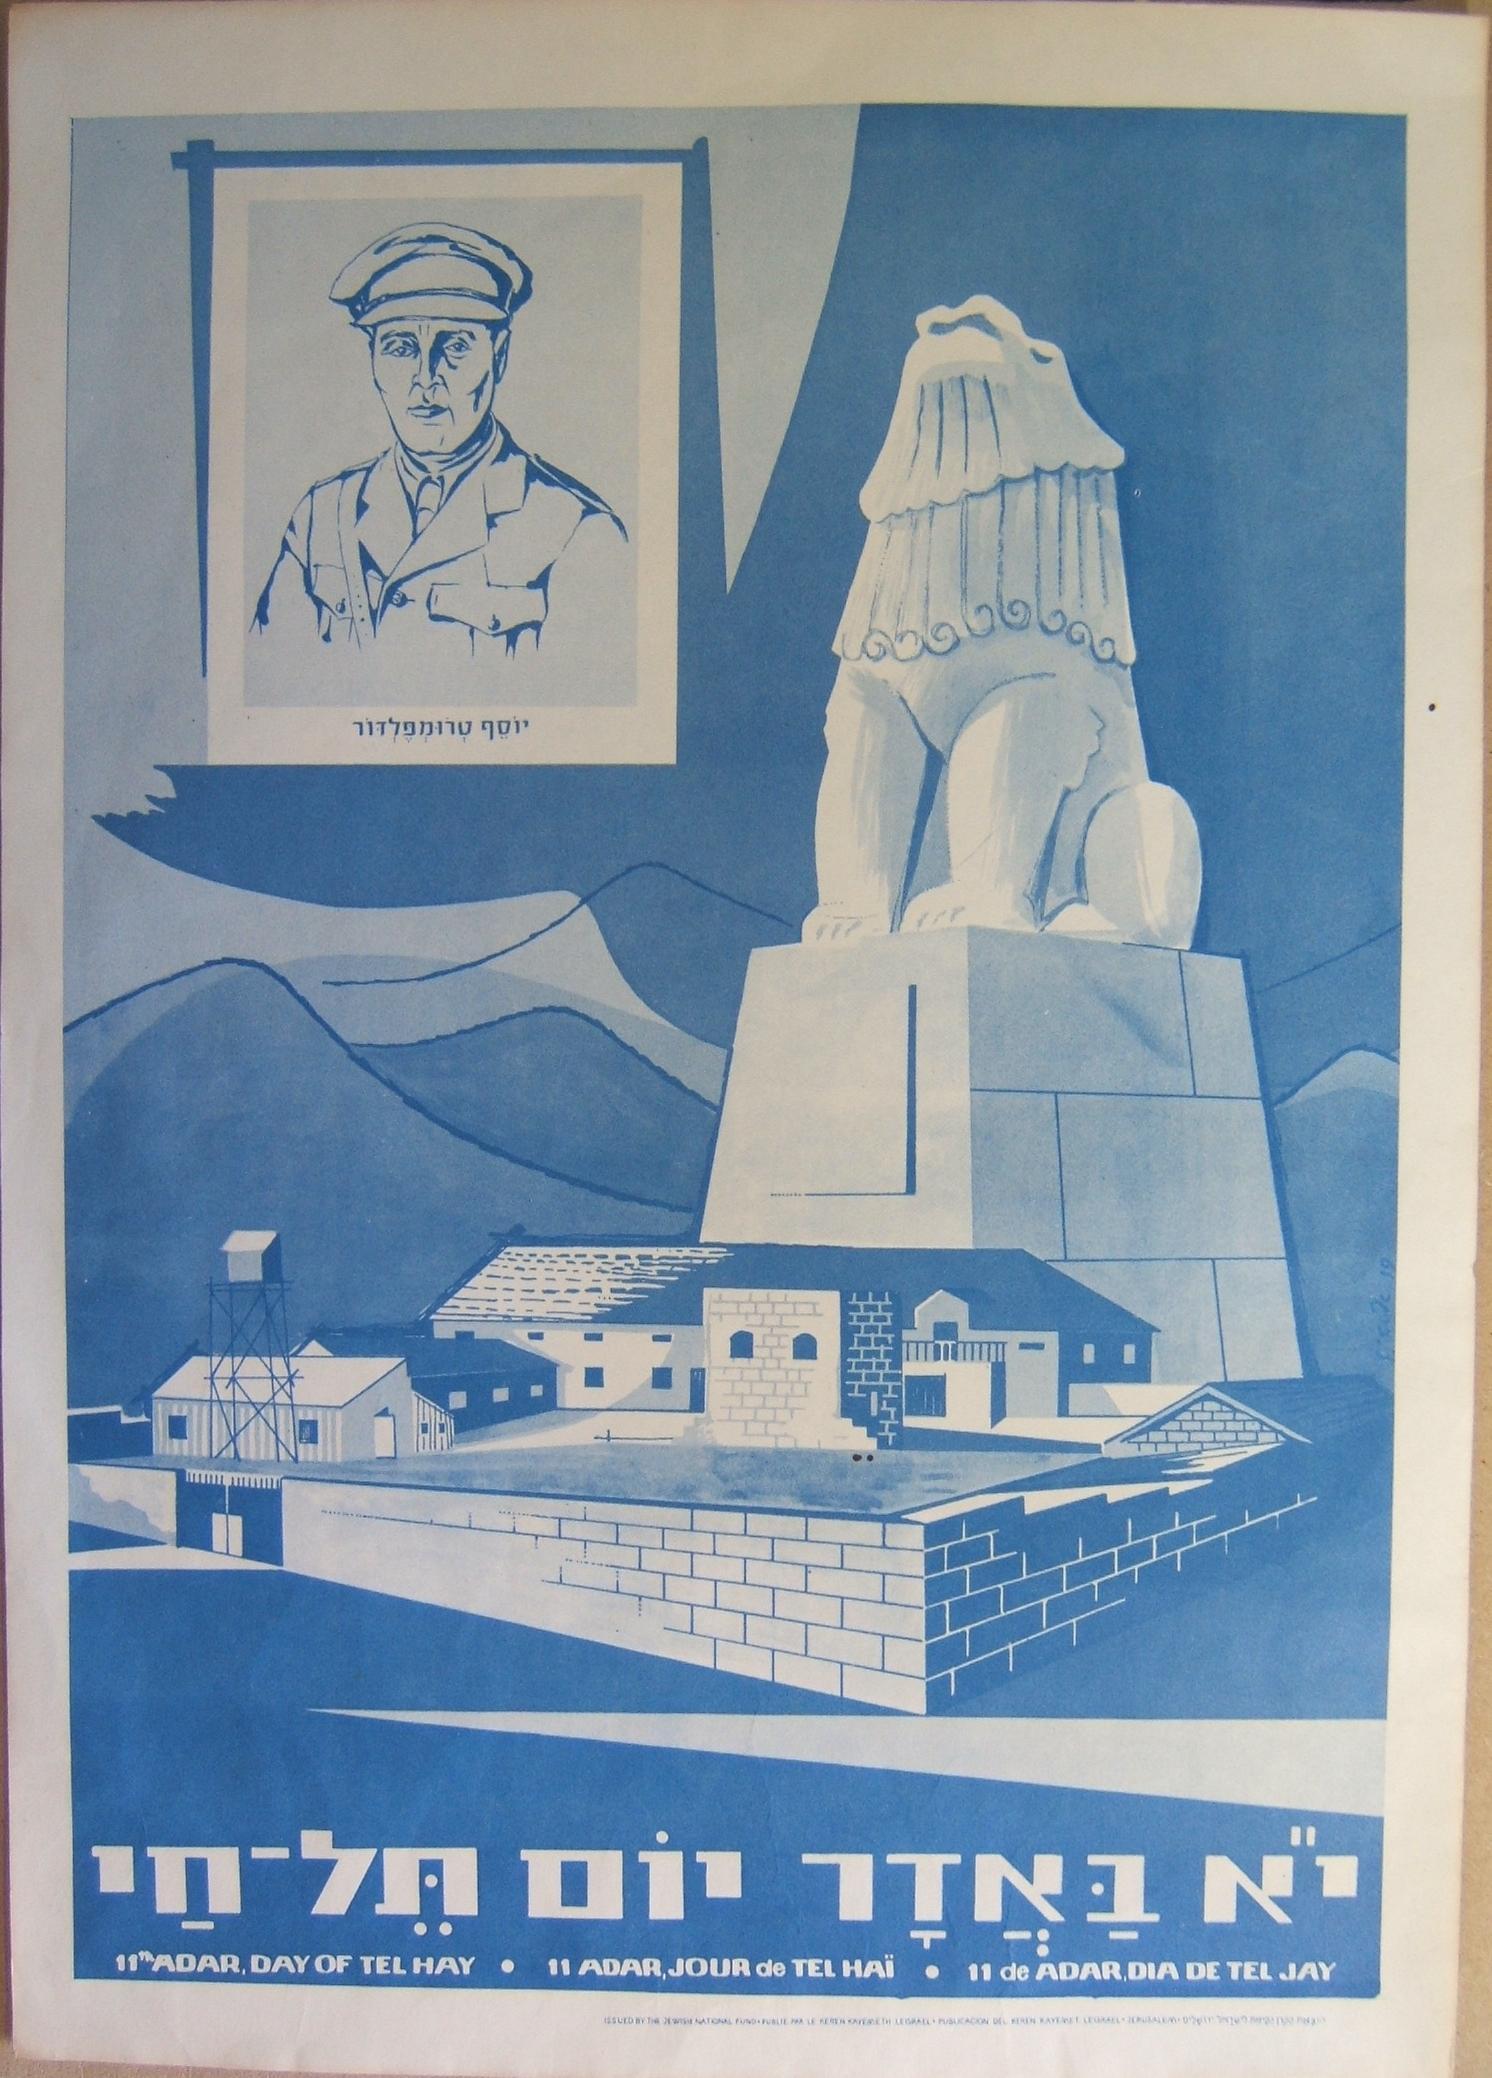 Israeli JNF Zionist Tel Hai Day poster of Joseph Trumpeldor, 1961 by Z. Berter